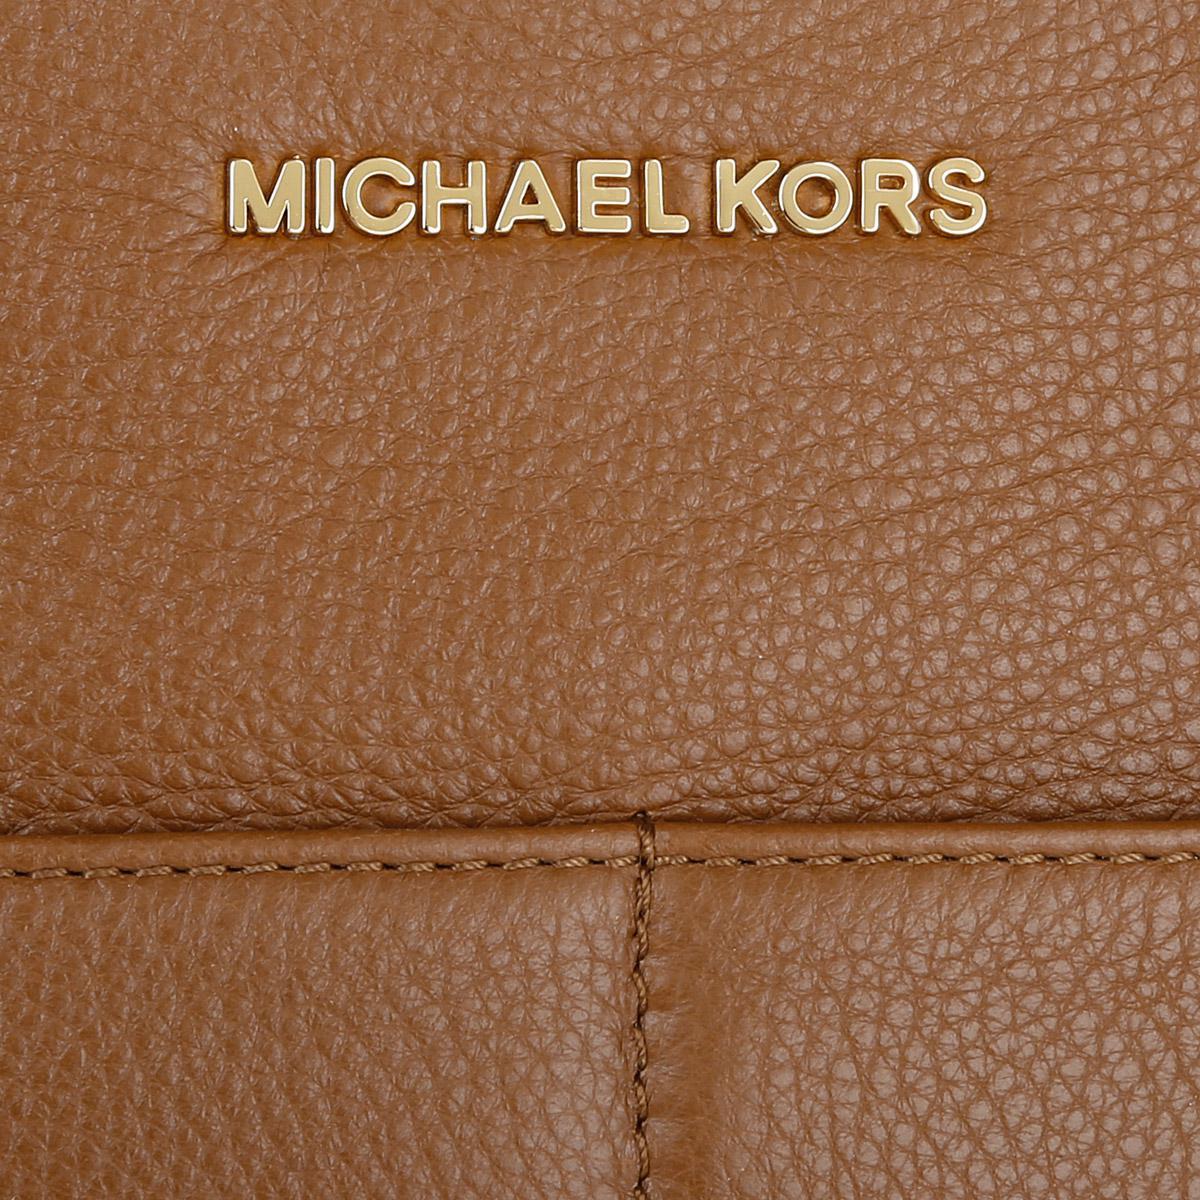 Michael Kors Leather Bedford Tz Pocket Tote Luggage